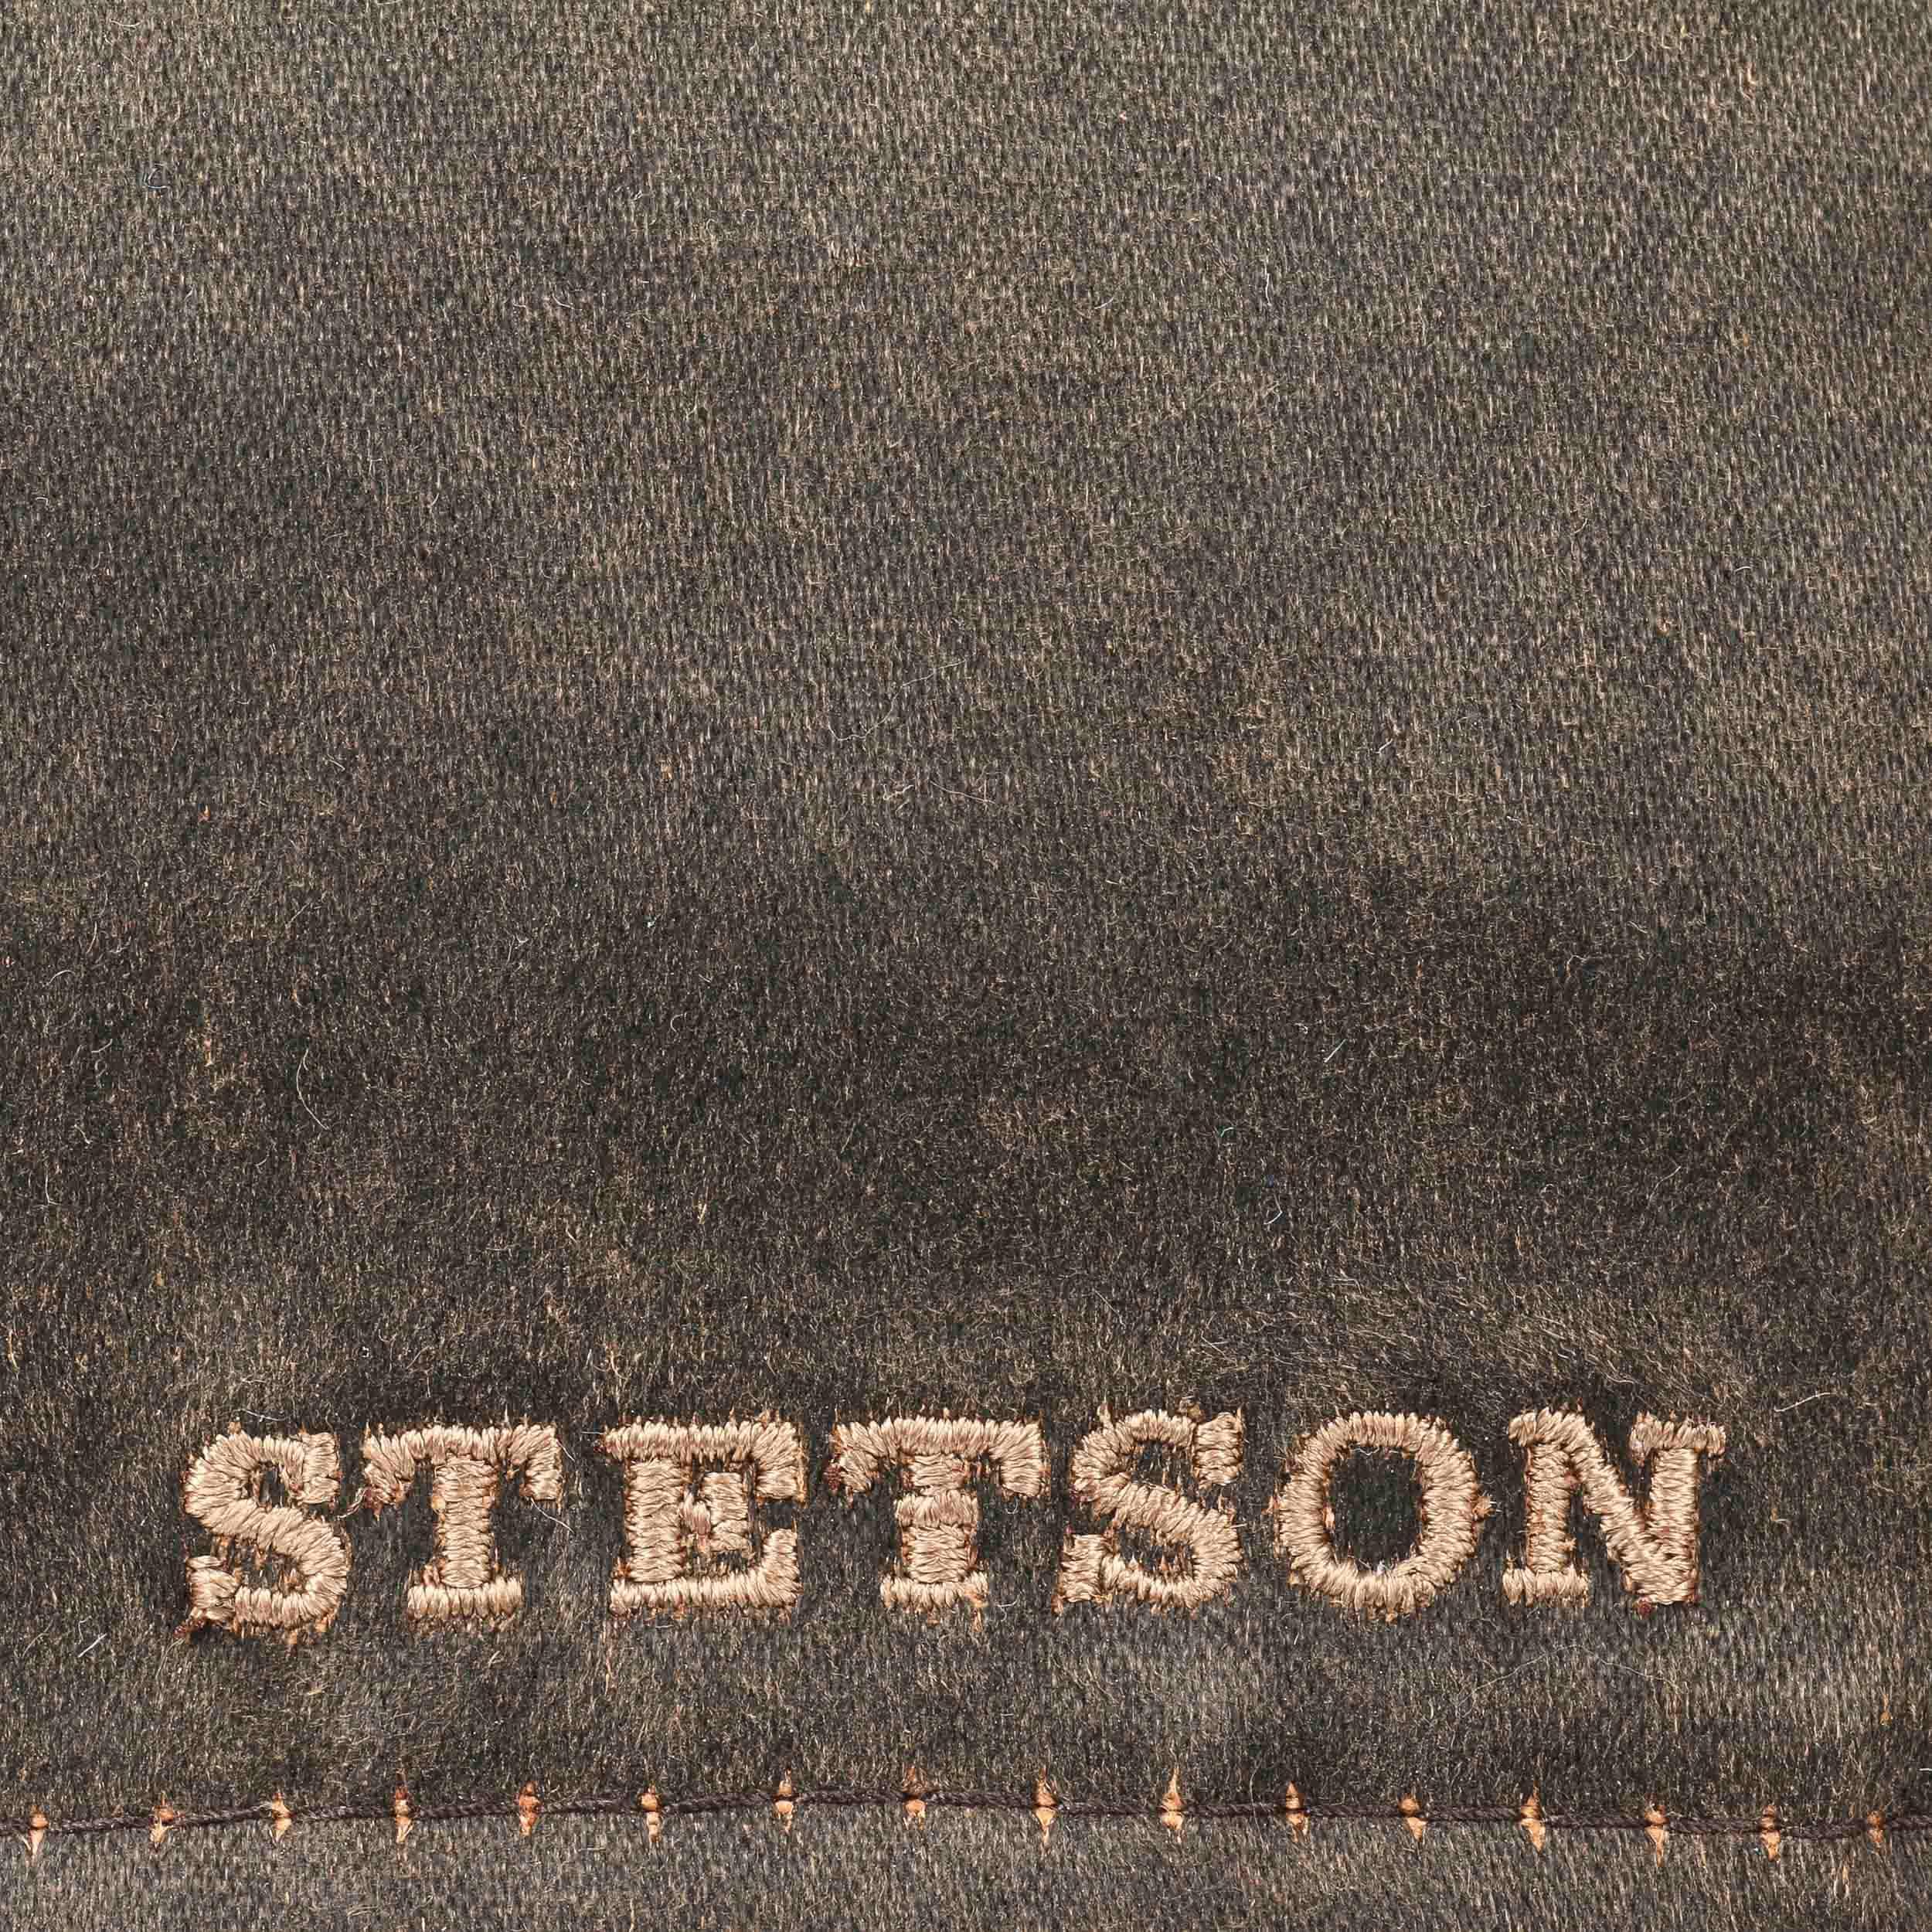 Gorra Gatsby Level by Stetson - Gorras - sombreroshop.es 9eb8fc510ca